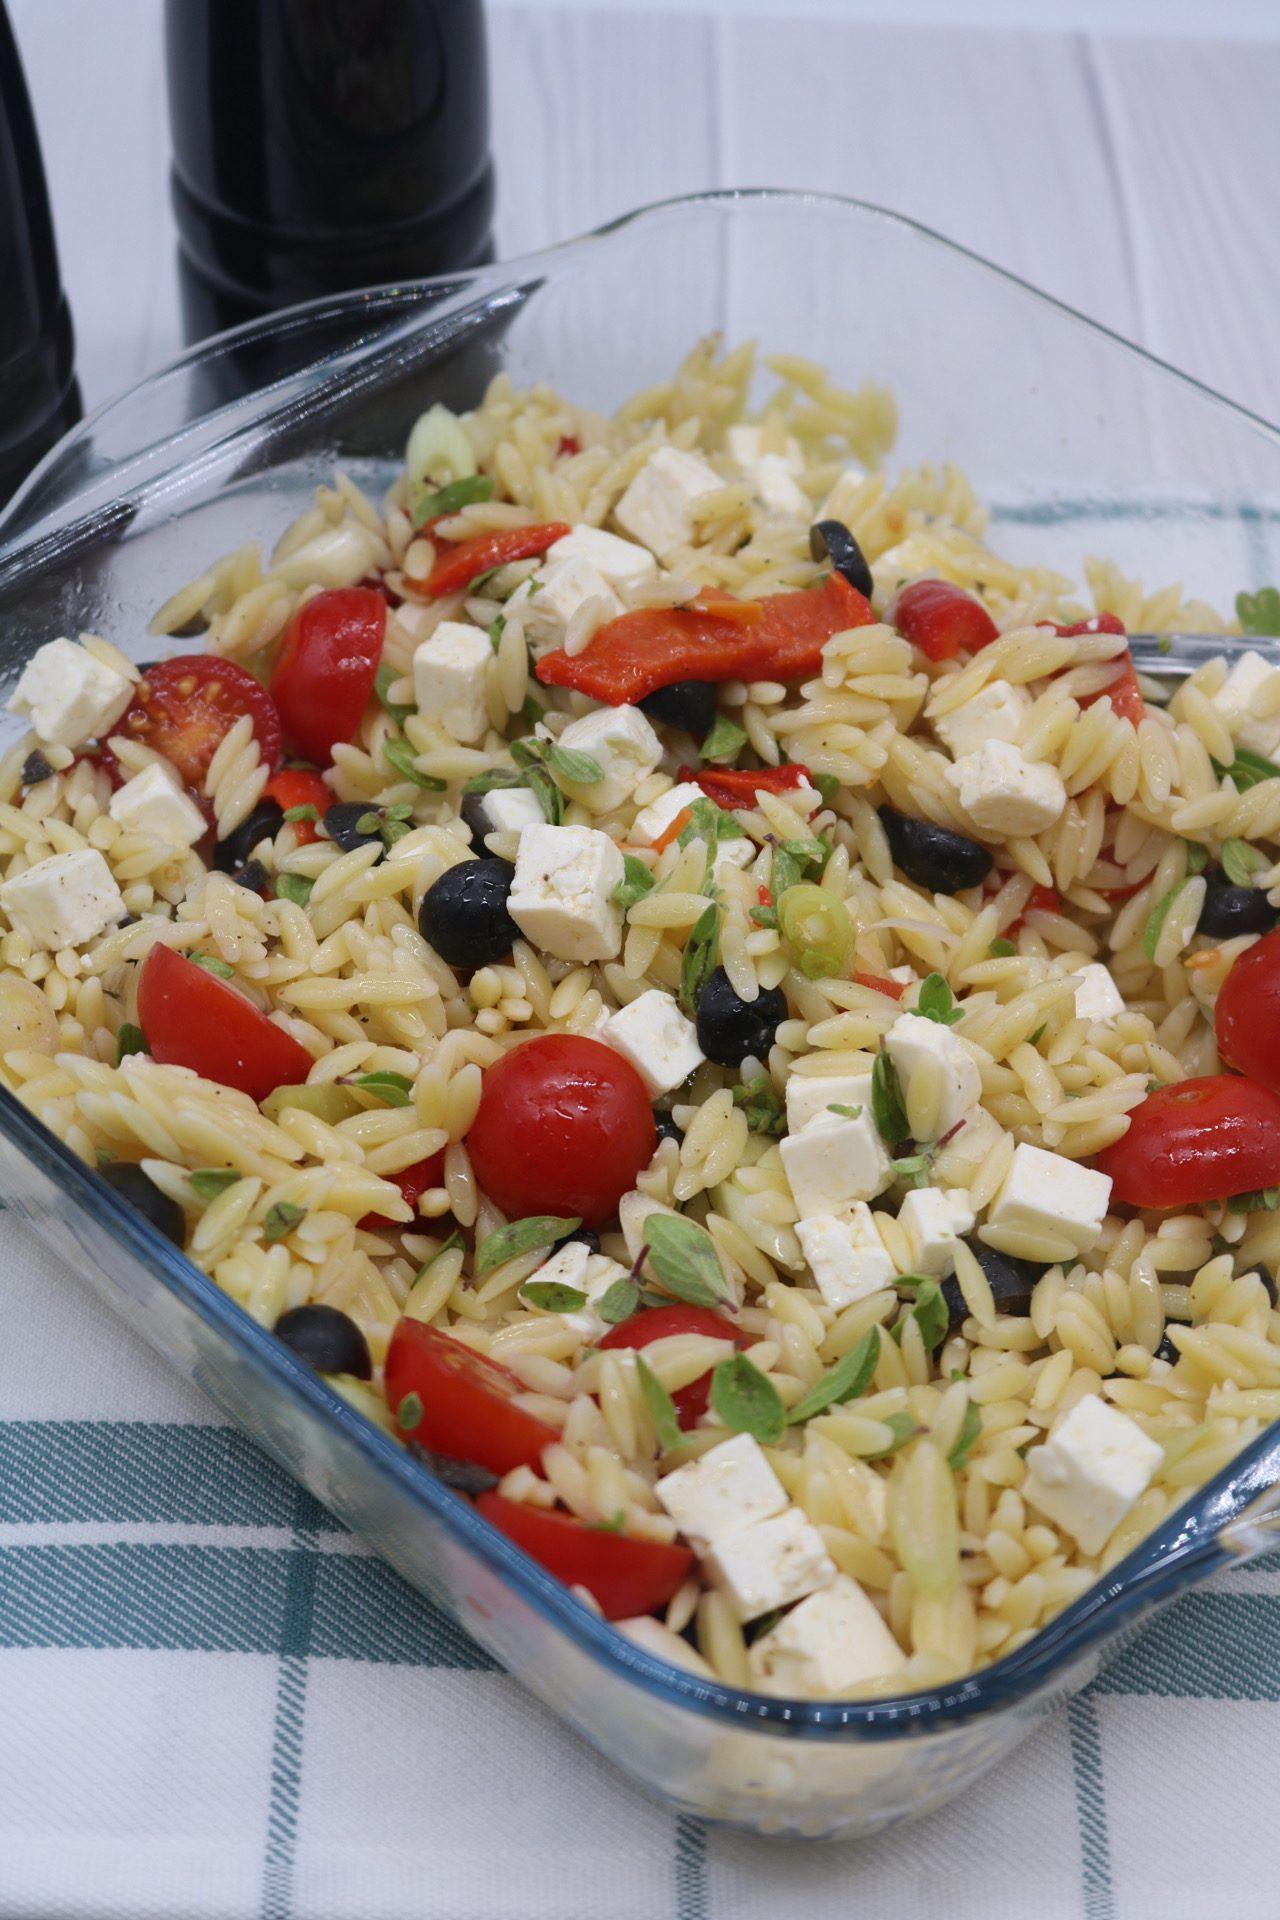 Orzo Salad with Feta, Orzo Salad with Feta